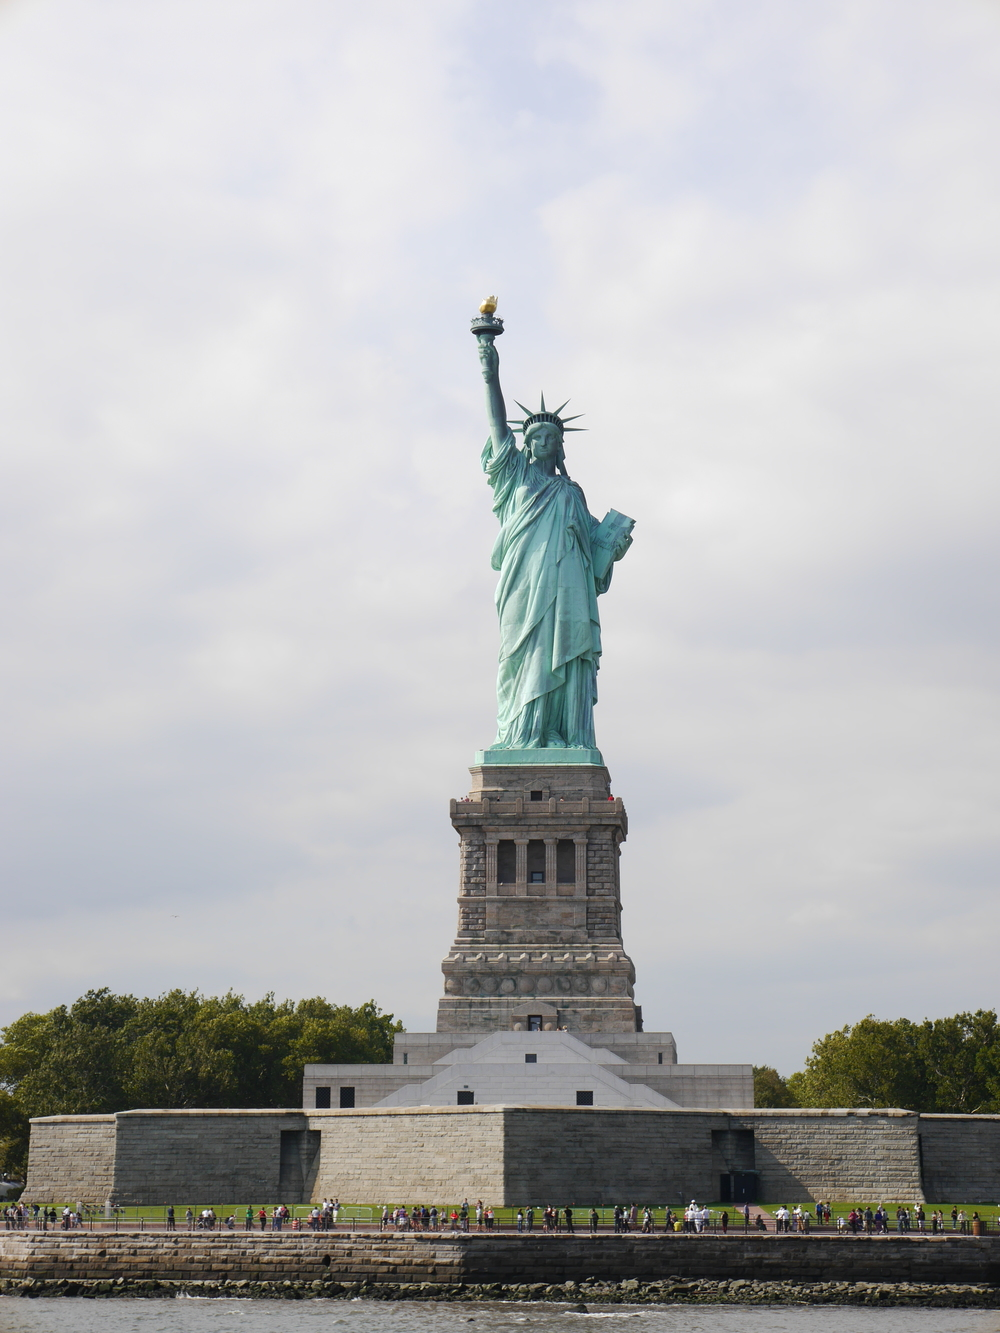 The Statue of Liberty, New York, NY, USA